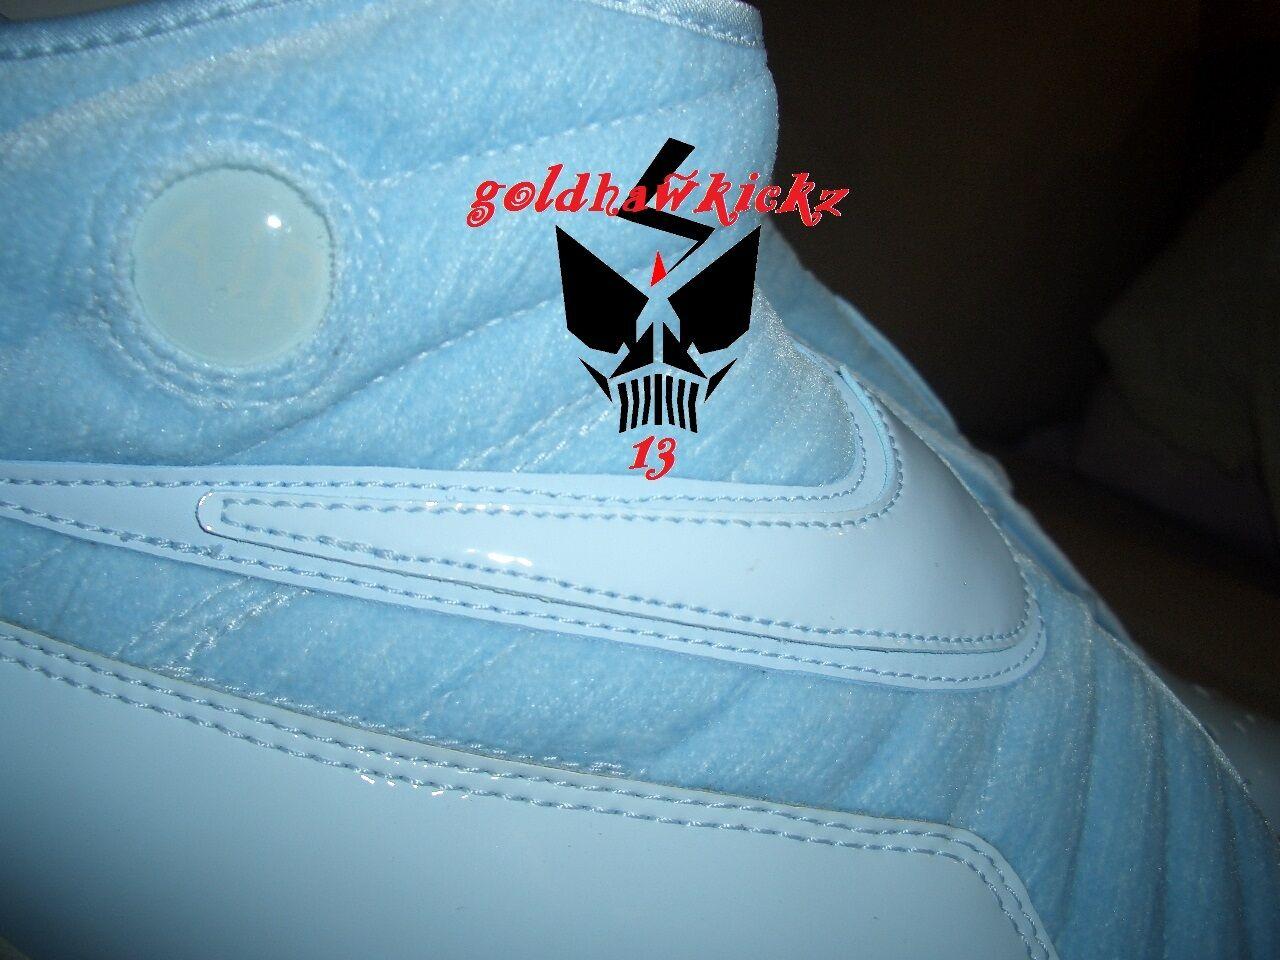 Nike Air Shake Ndestrukt QS easter 943020-400 bluee tint tint tint dennis rodman IN STOCK cb411c